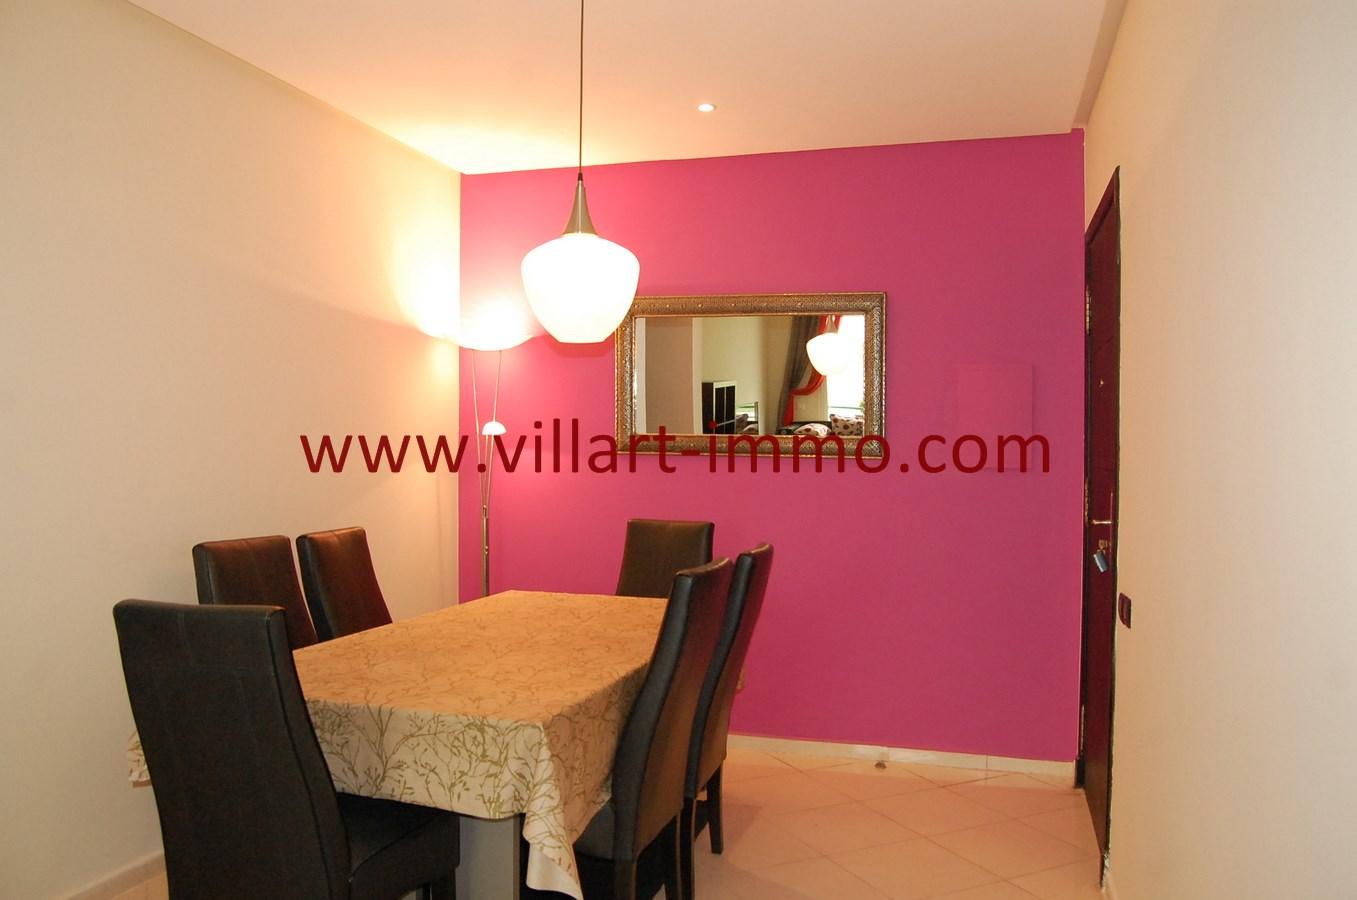 3-Vente-Appartement-Tanger-Séjour-VA480-Villart Immo